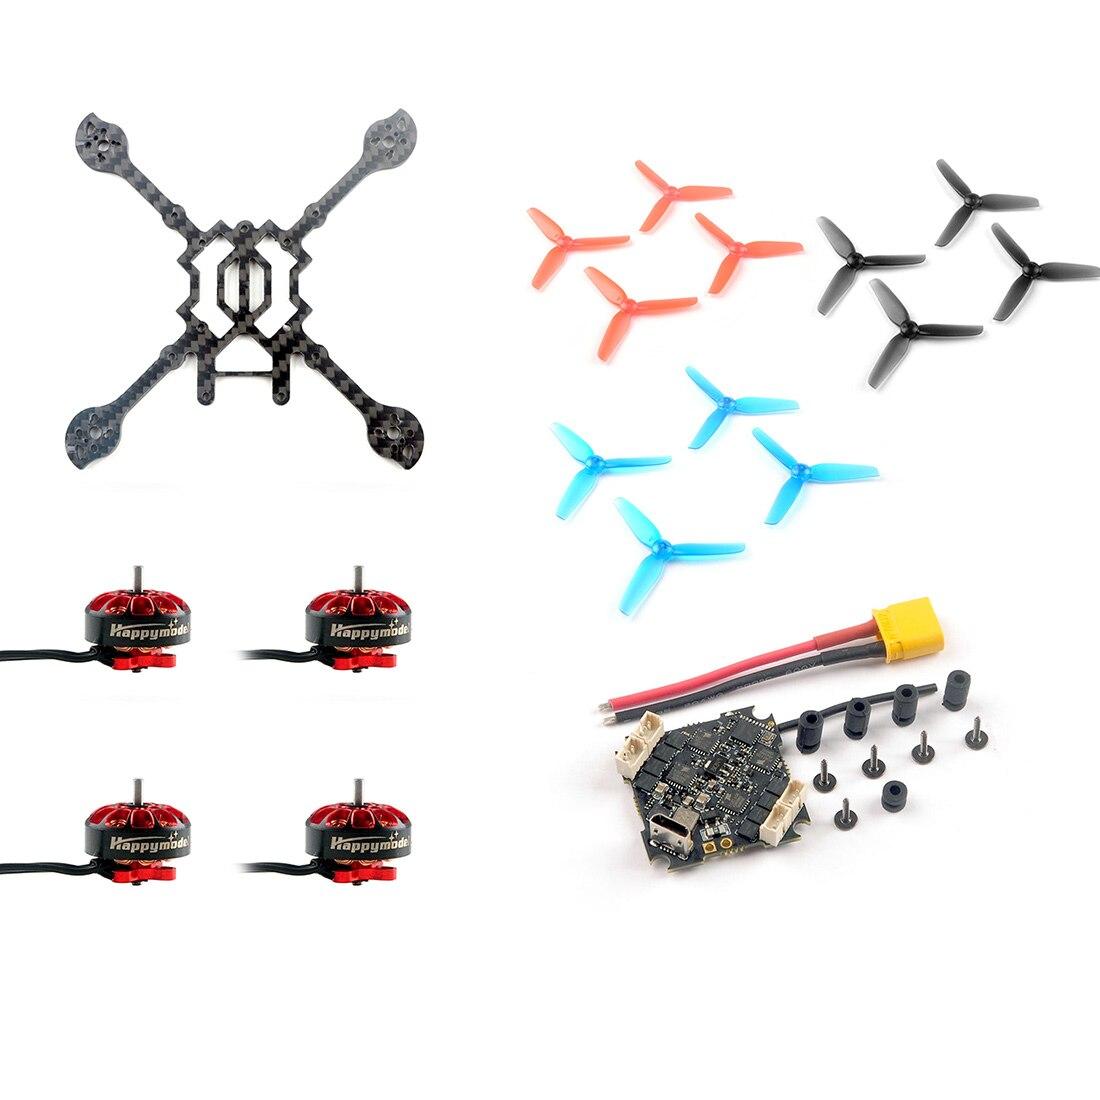 Happymodel Larve X HD FPV Racing Drone DIY Zubehör Kit w/125mm Rahmen Kit Crazybee F4 PRO V3.0 flight Controller